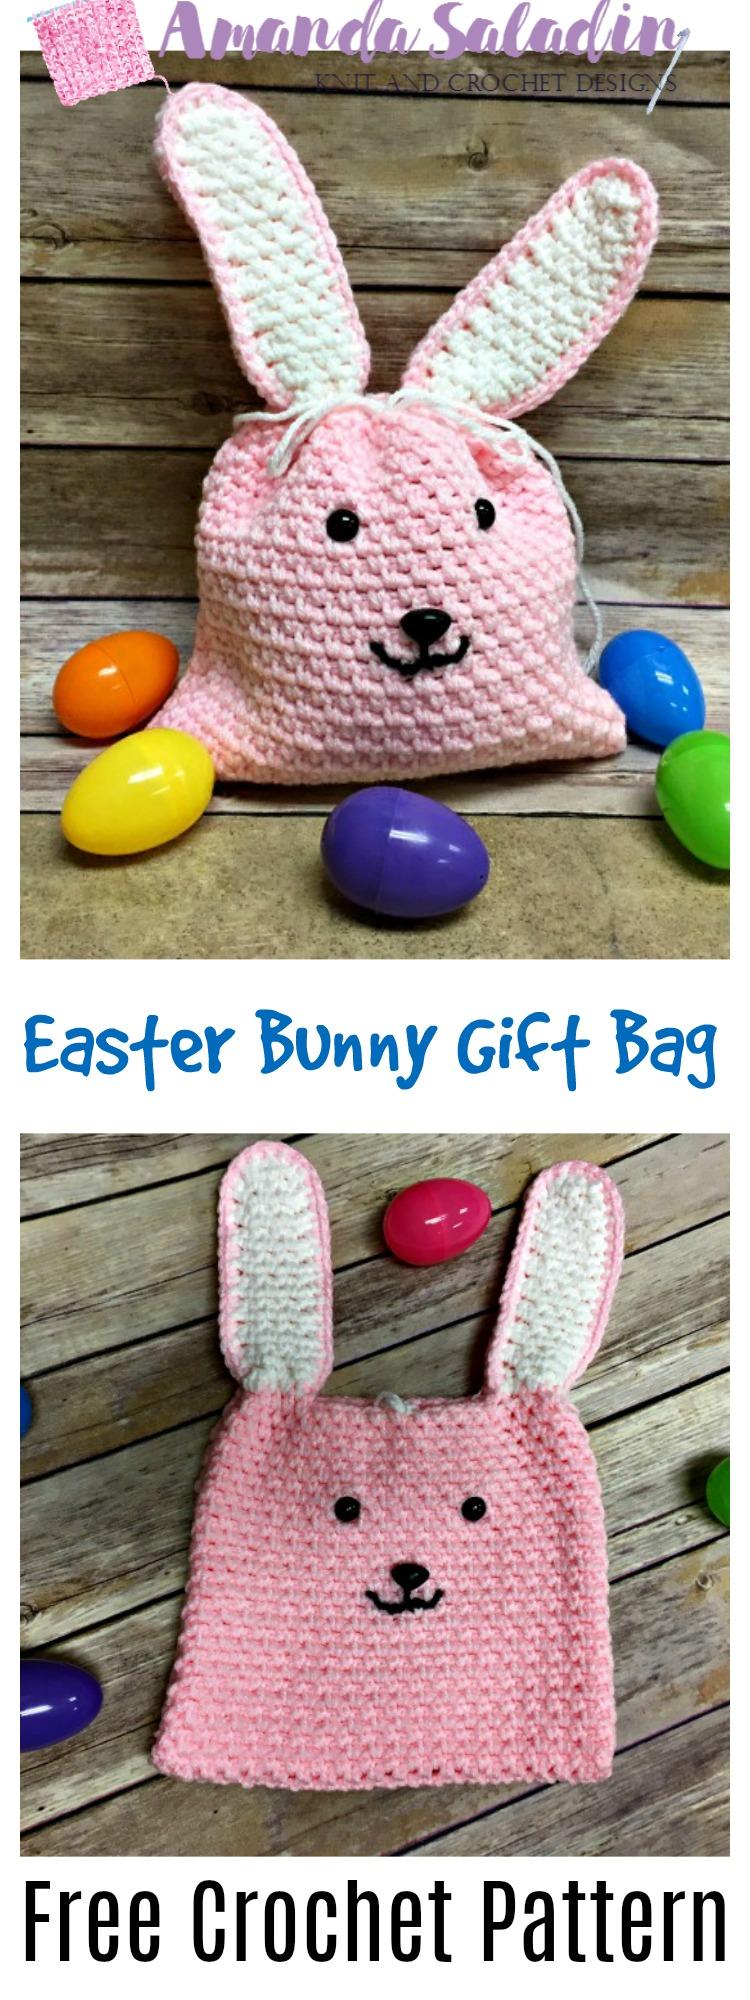 Free Crochet Pattern - Easter Bunny Gift Bag